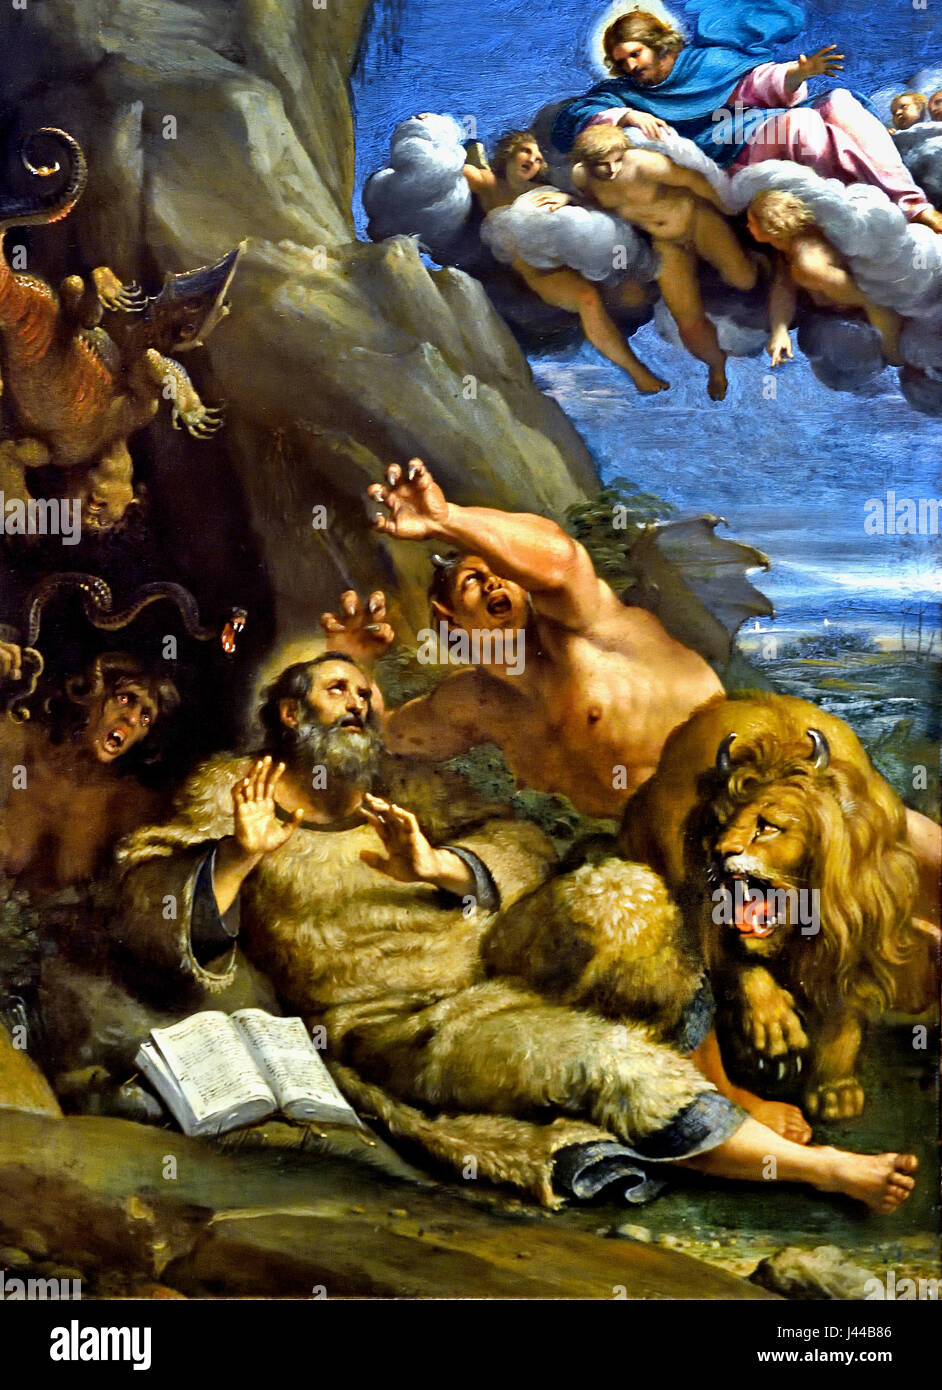 Le Christ apparaissant à Saint Antoine Abbé pendant sa tentation 1598 Annibal Carrache1560 - 1609 Italie Photo Stock